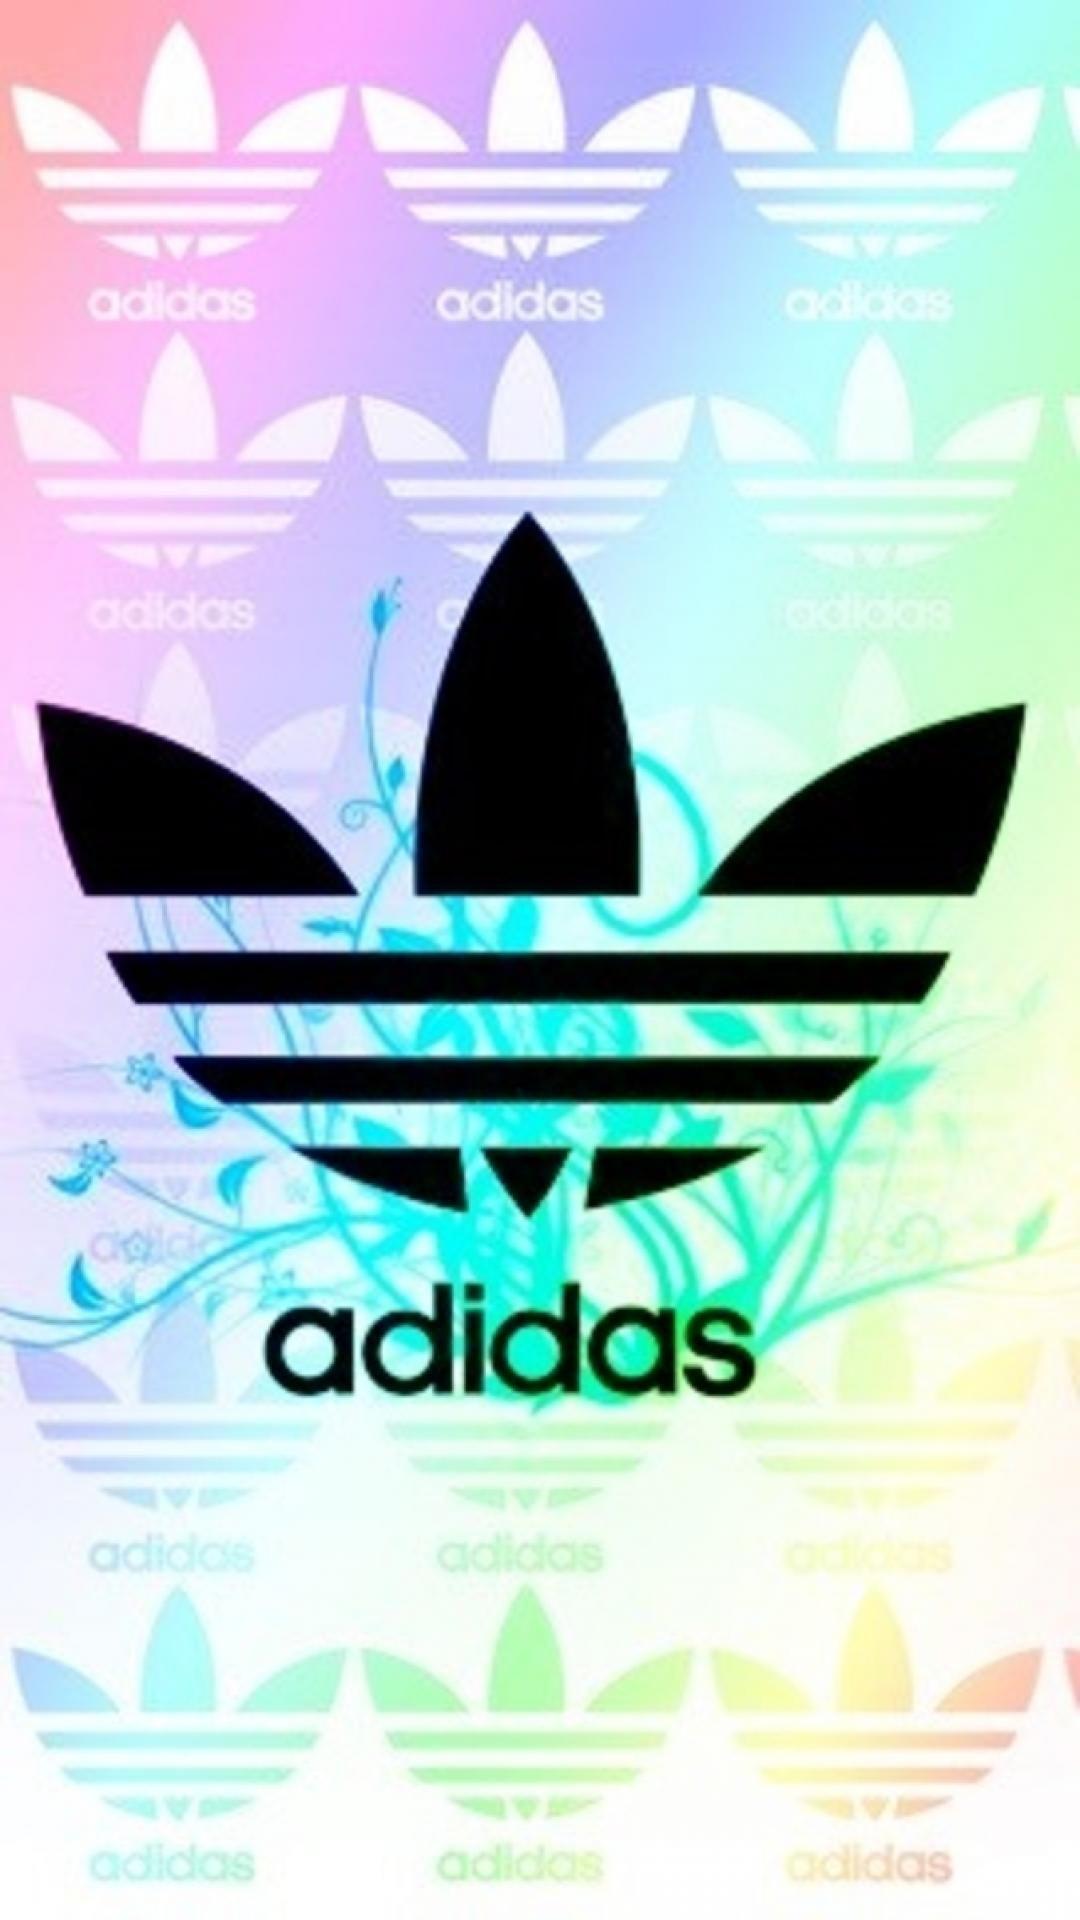 iPhone 6 Wallpaper Adidas logo wallpapers, Adidas